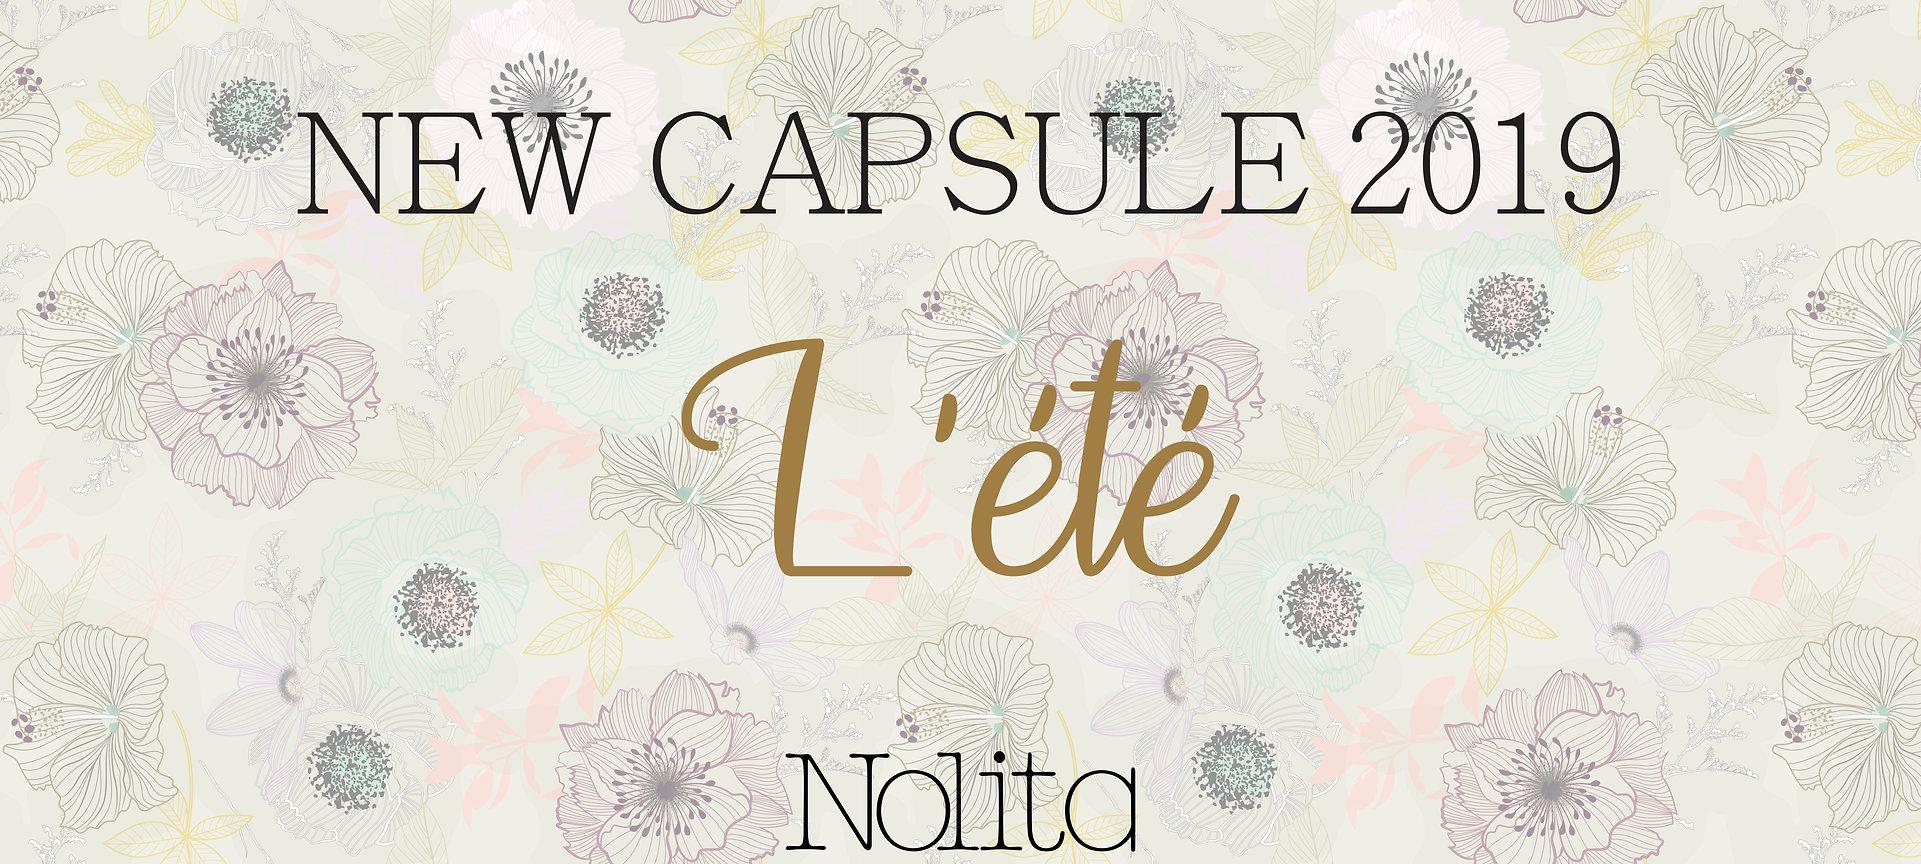 Capsule-2019-L'ètè.jpg